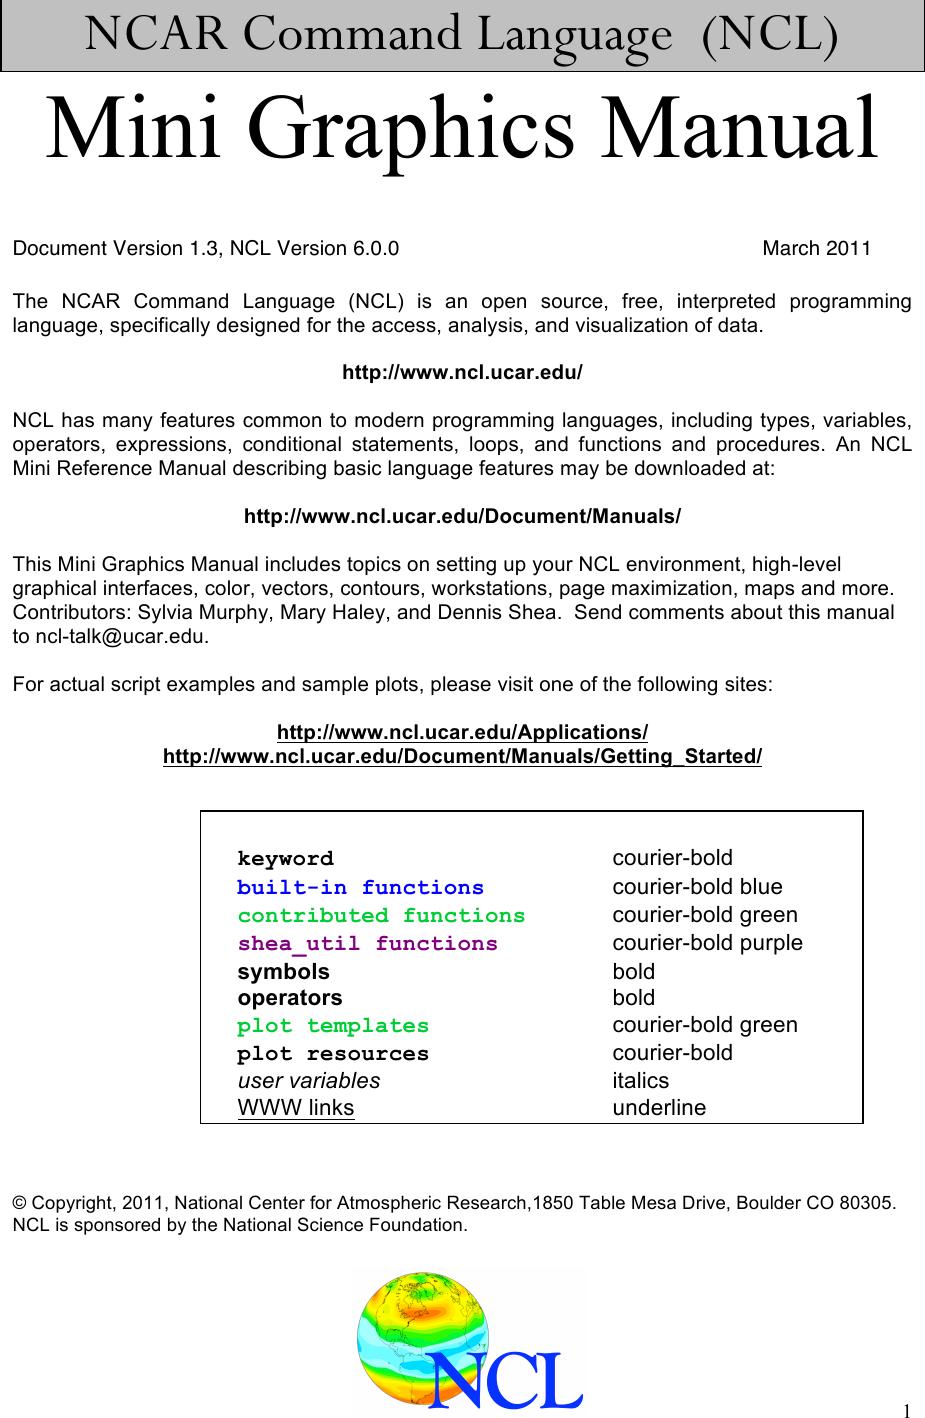 NCAR Graphics Manual